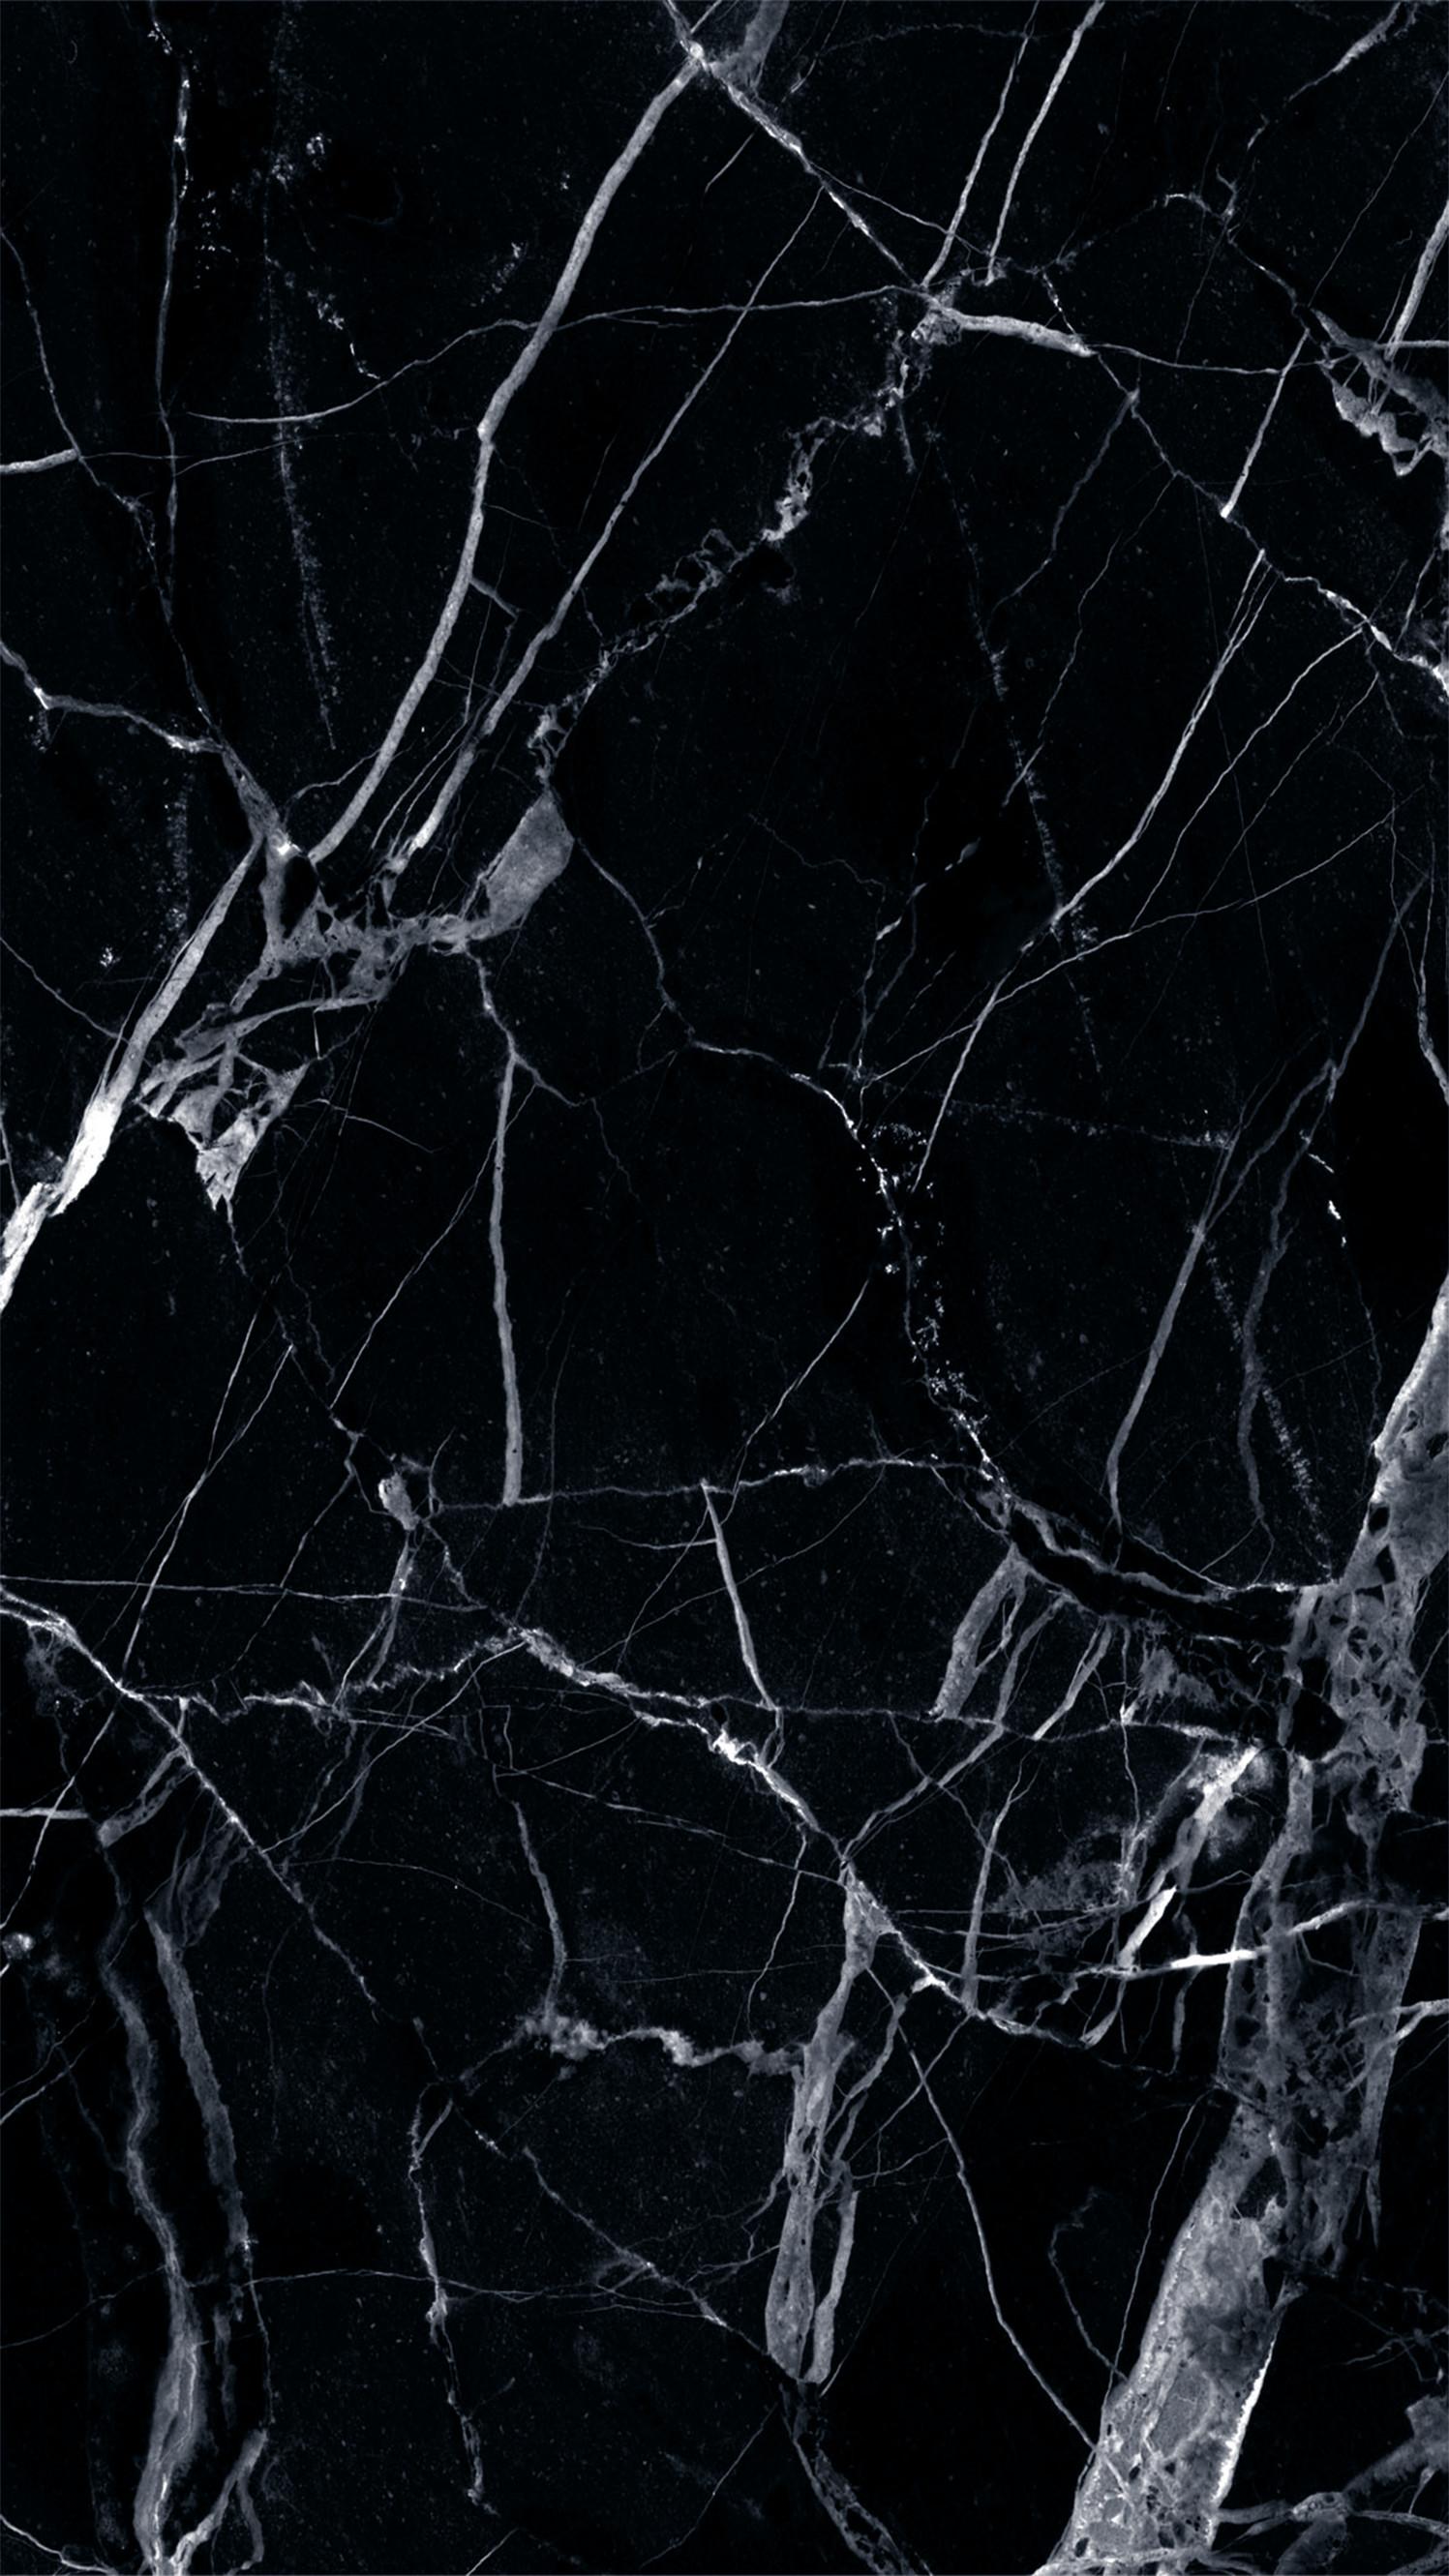 Res: 1497x2662, Black Home Screen By Jason Zigrino